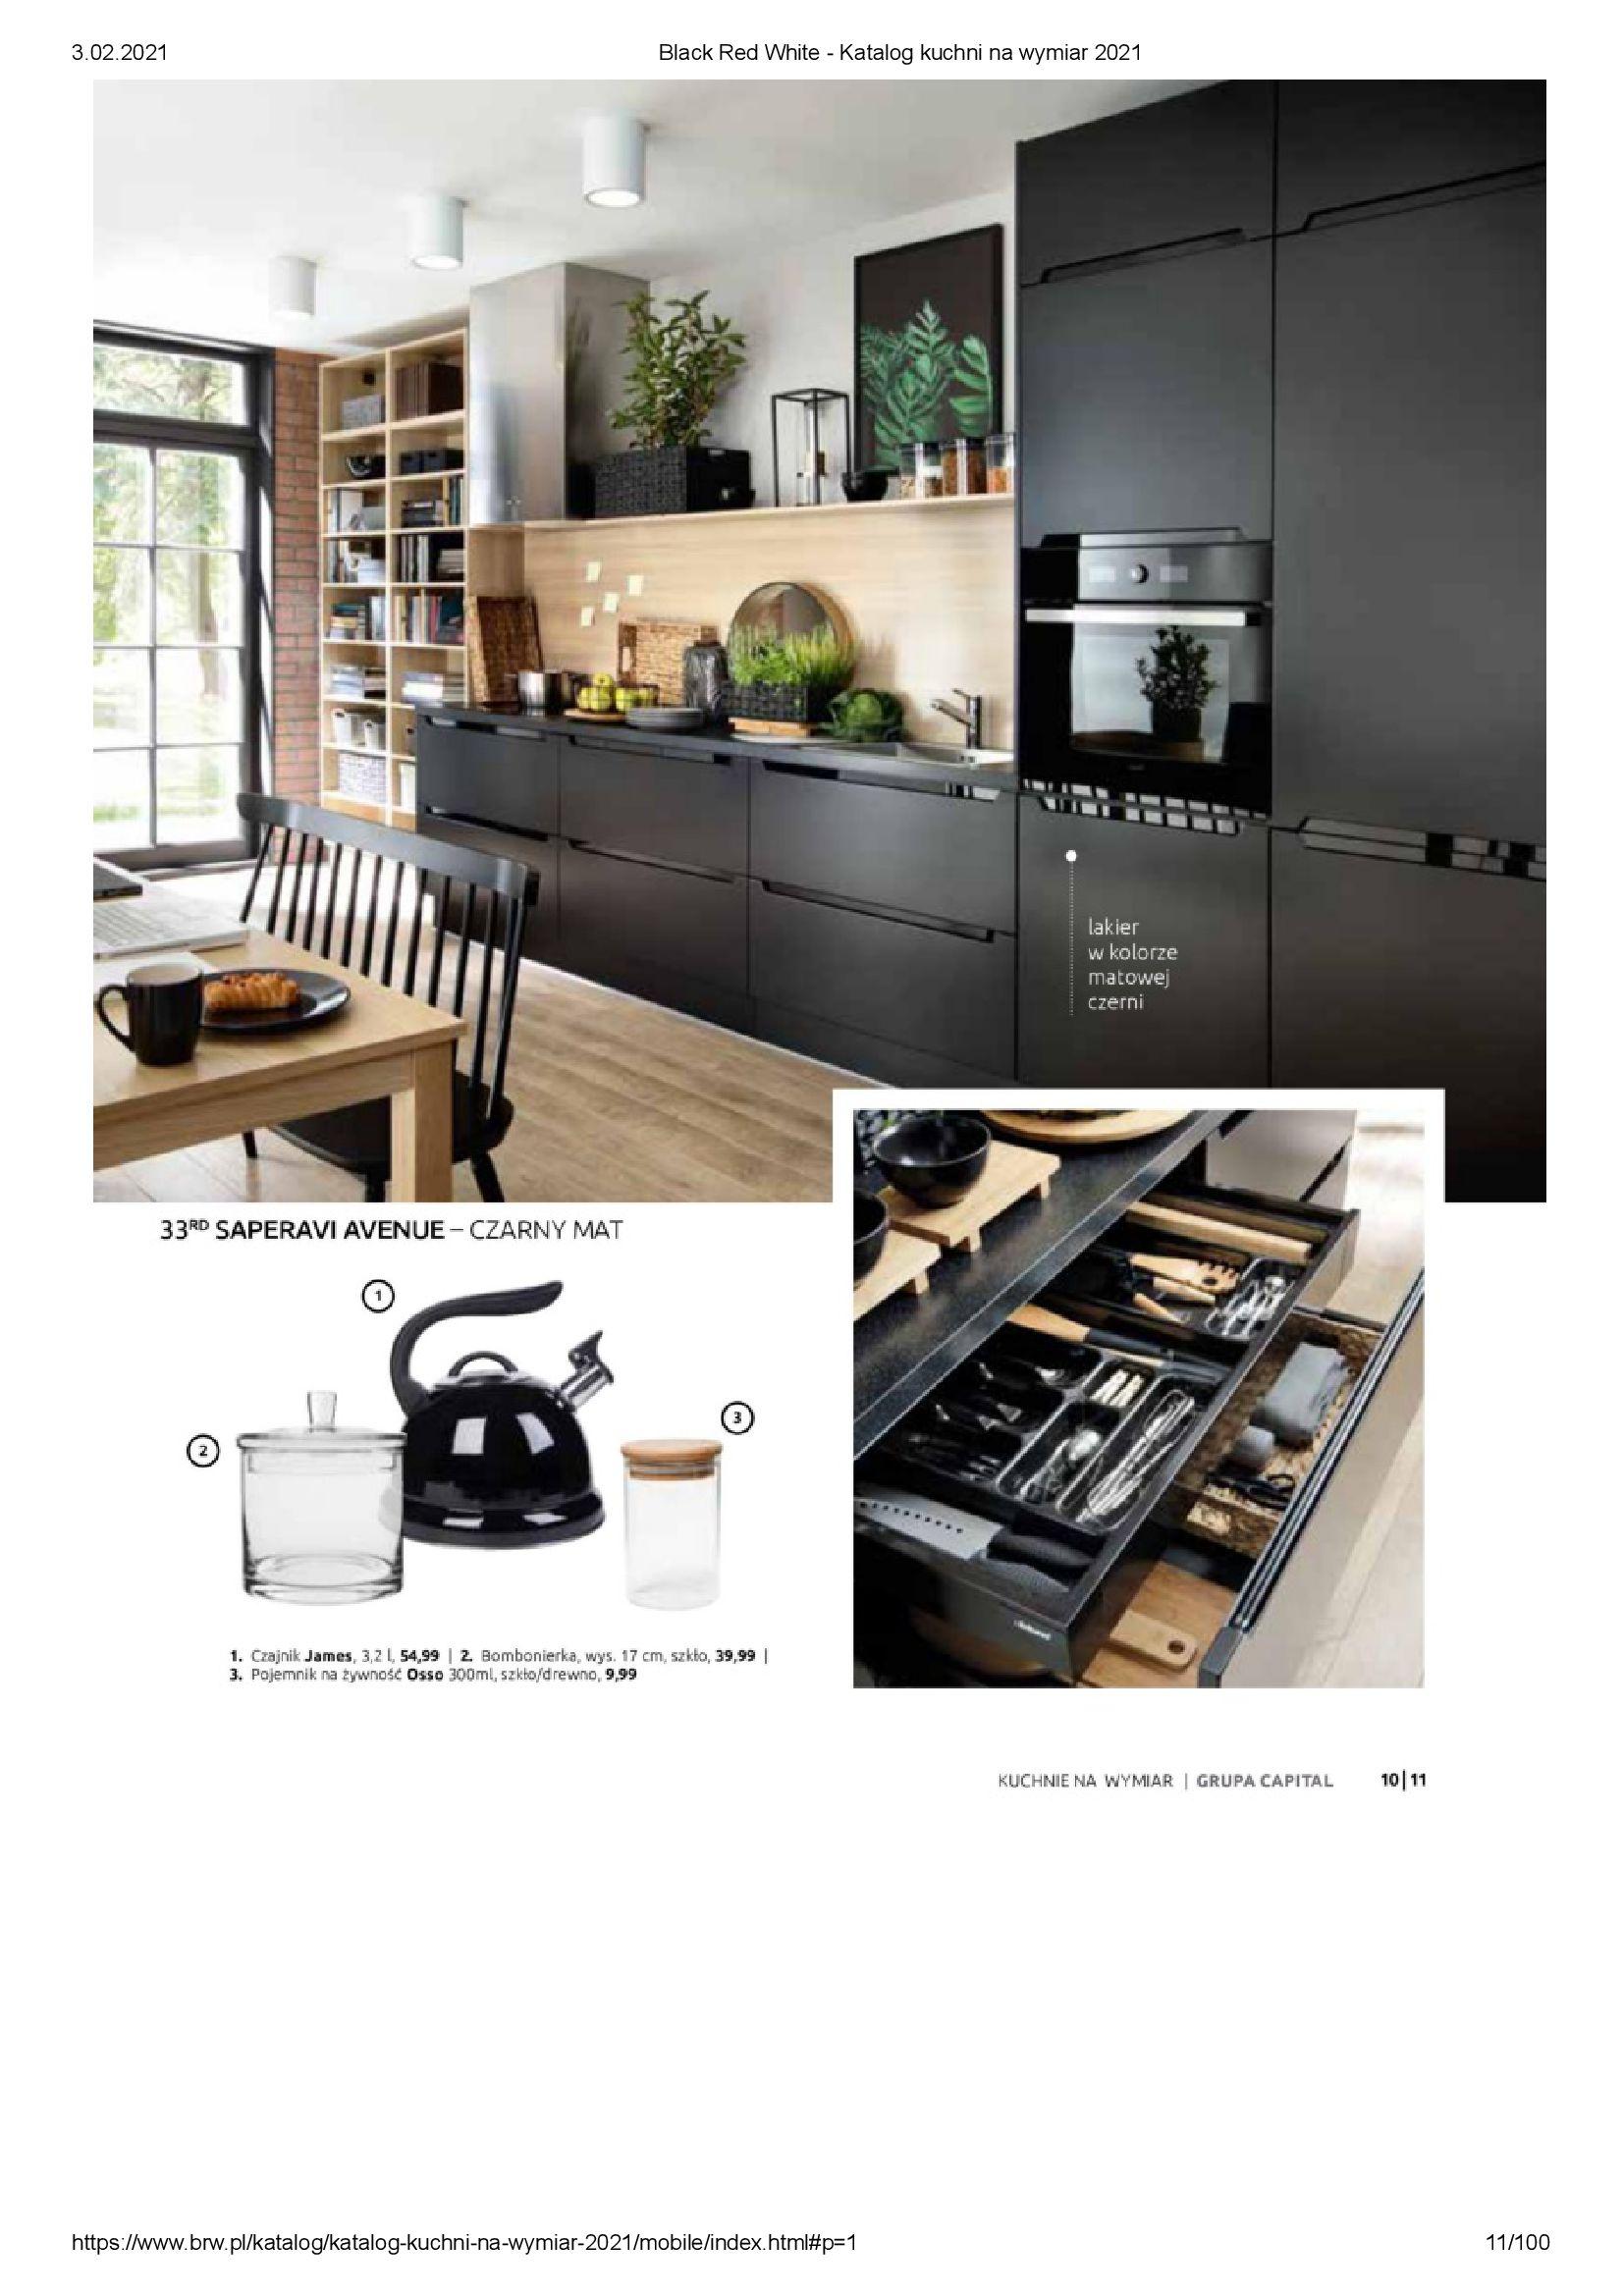 Gazetka Black Red White: Katalog - Kuchnie na wymiar Senso Kitchens 2021 2021-01-01 page-11